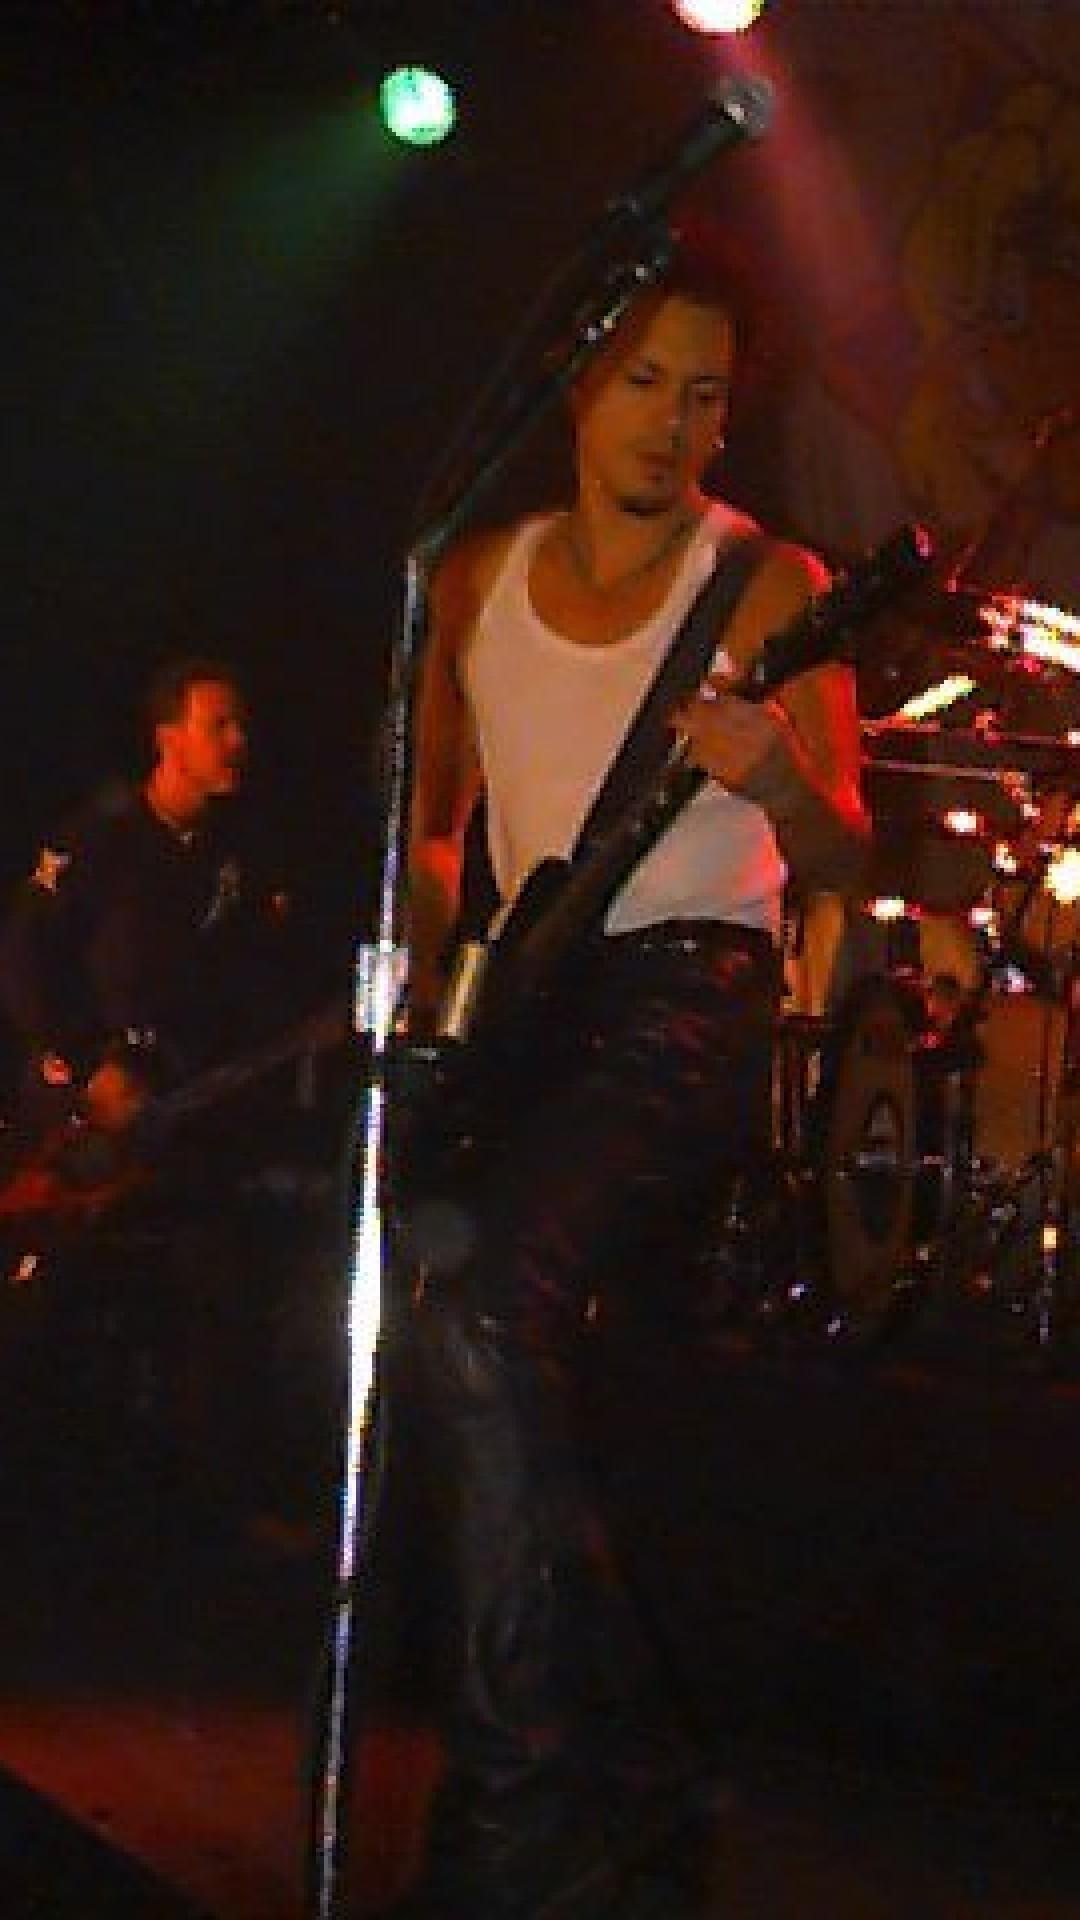 02_19_97_Metallica_Odeon.jpeg